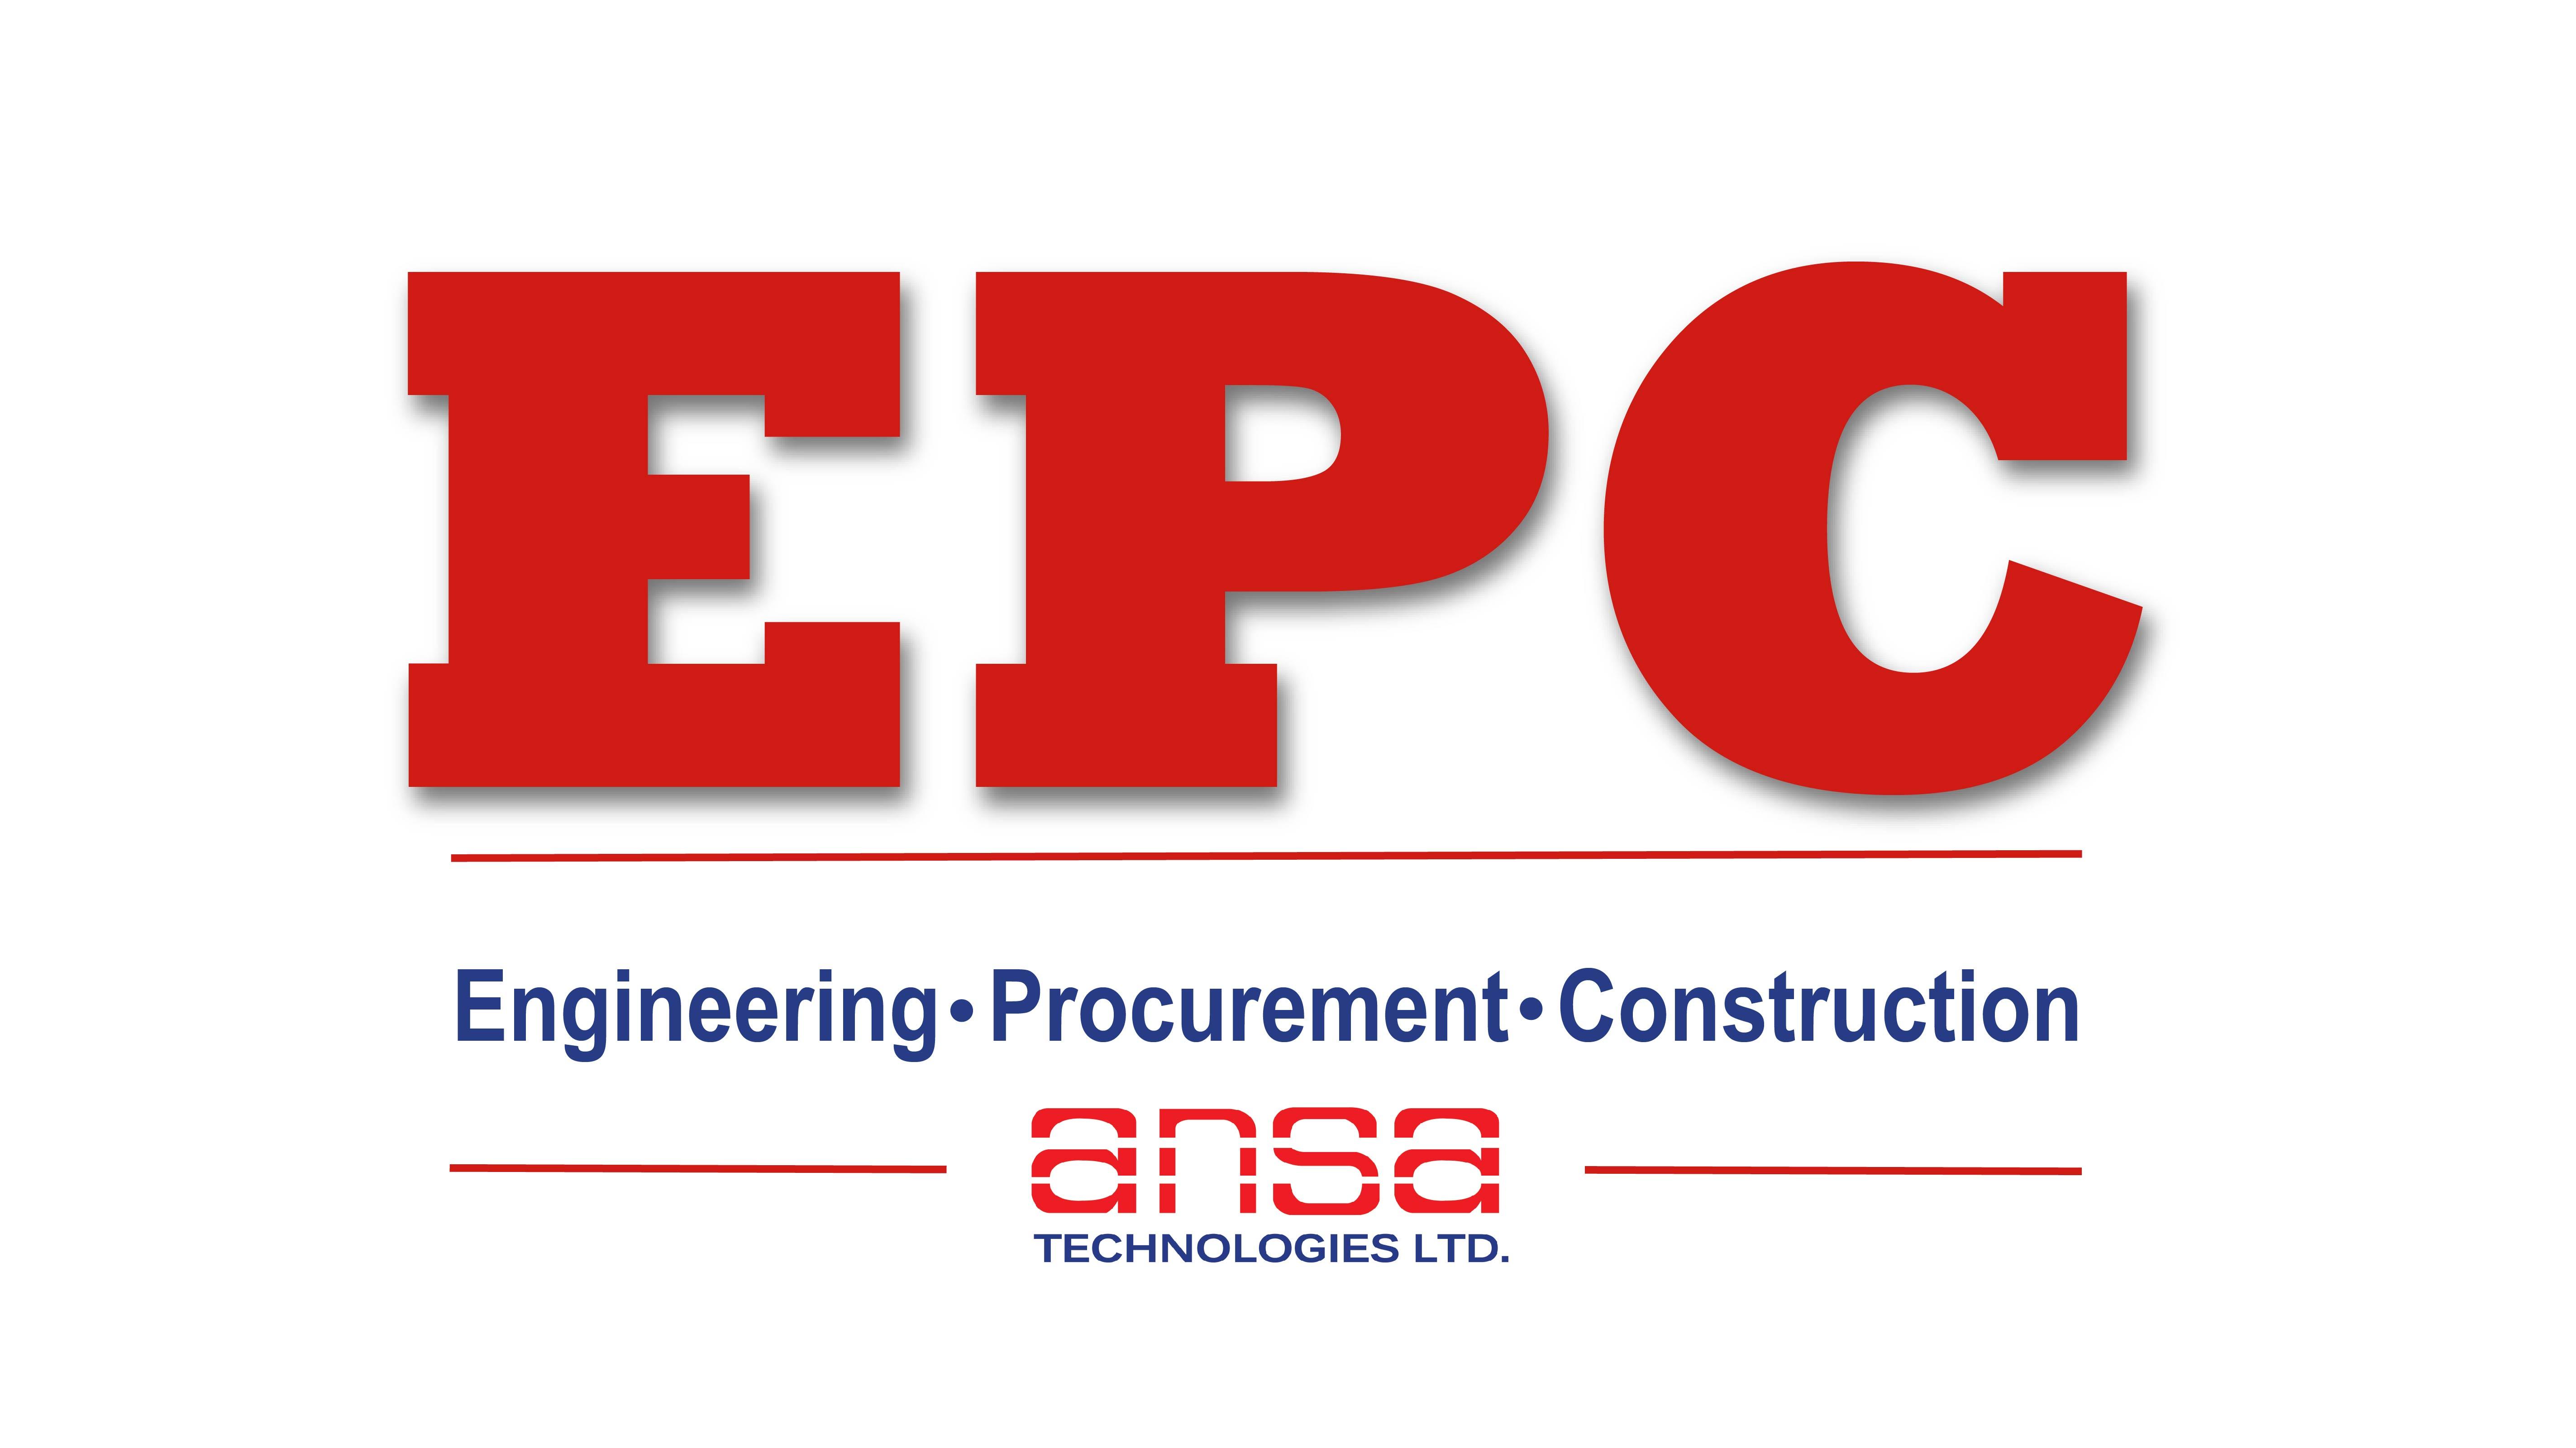 Engineering, Procurement, Construction, Ansa Technologies